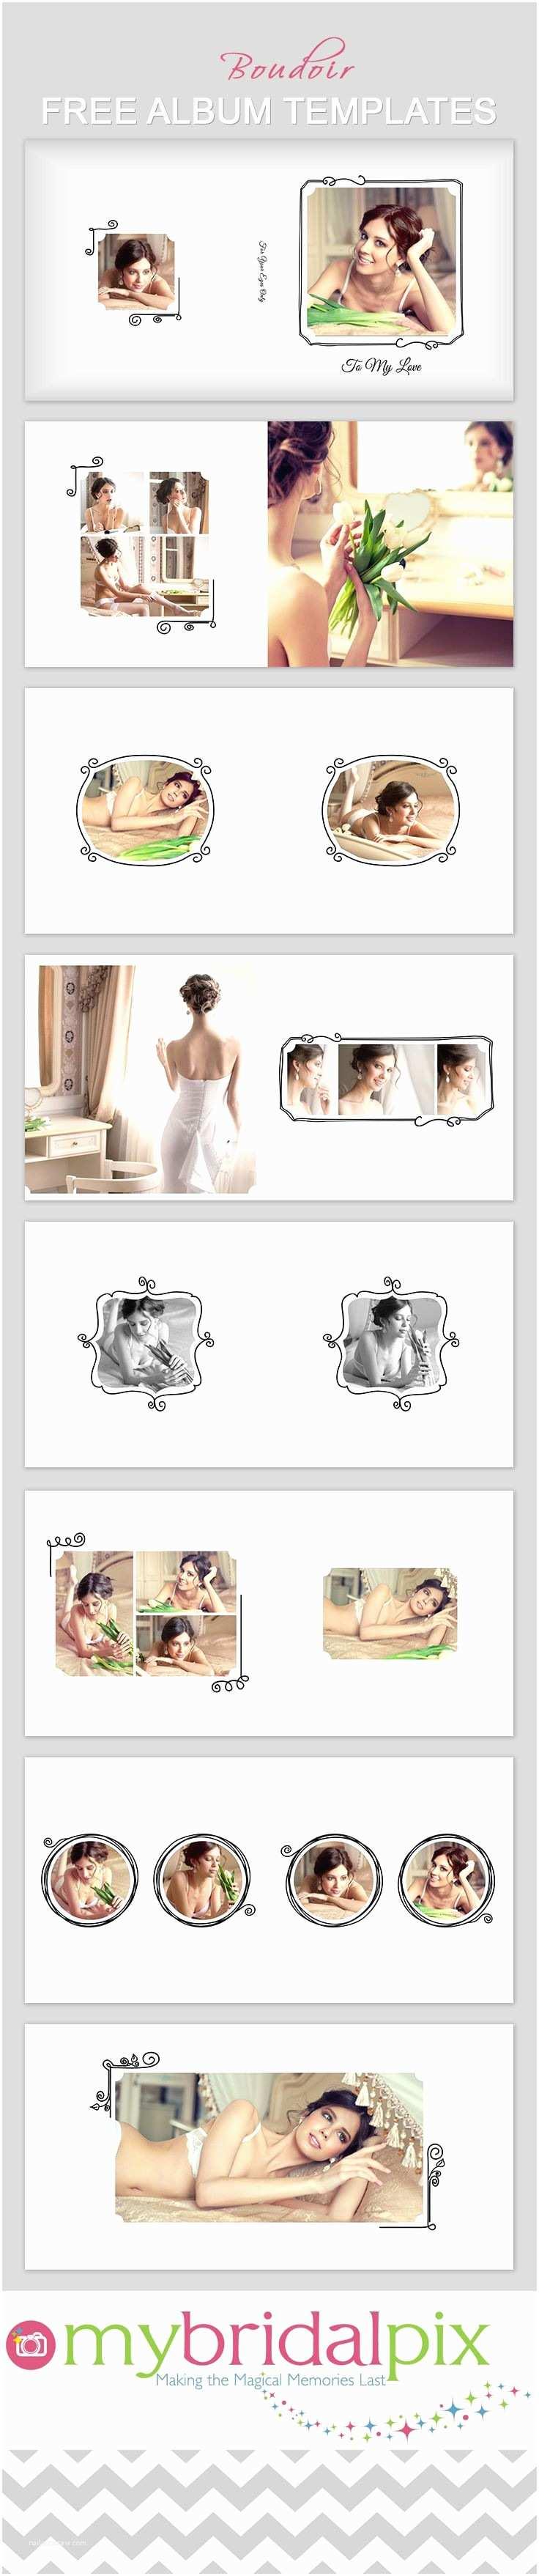 Groupon Wedding Invitations Luxury Groupon Wedding Invitations